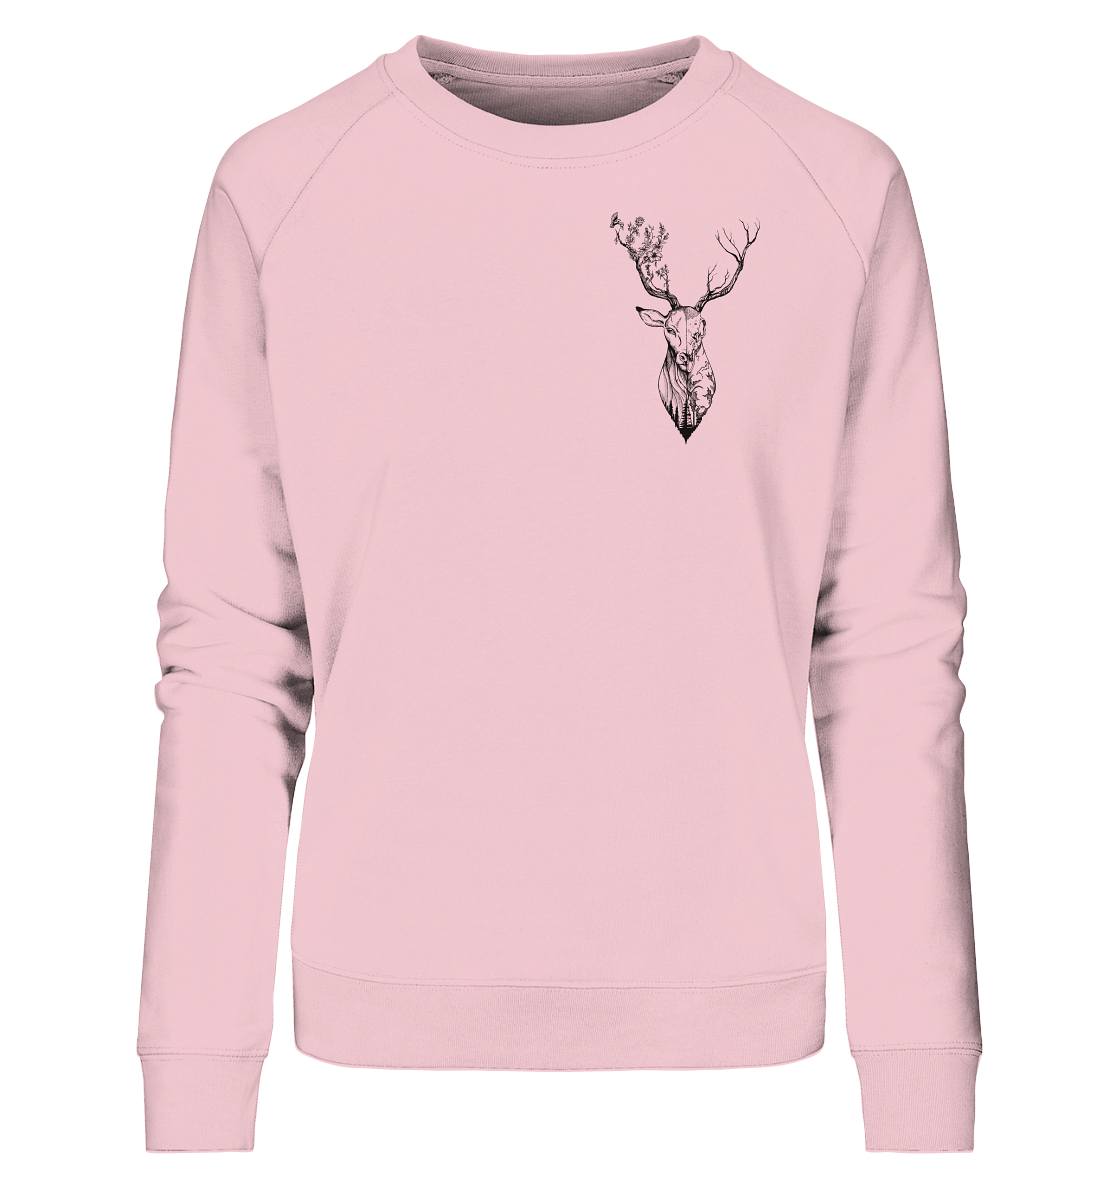 front-ladies-organic-sweatshirt-f2c9d0-1116x-7.png